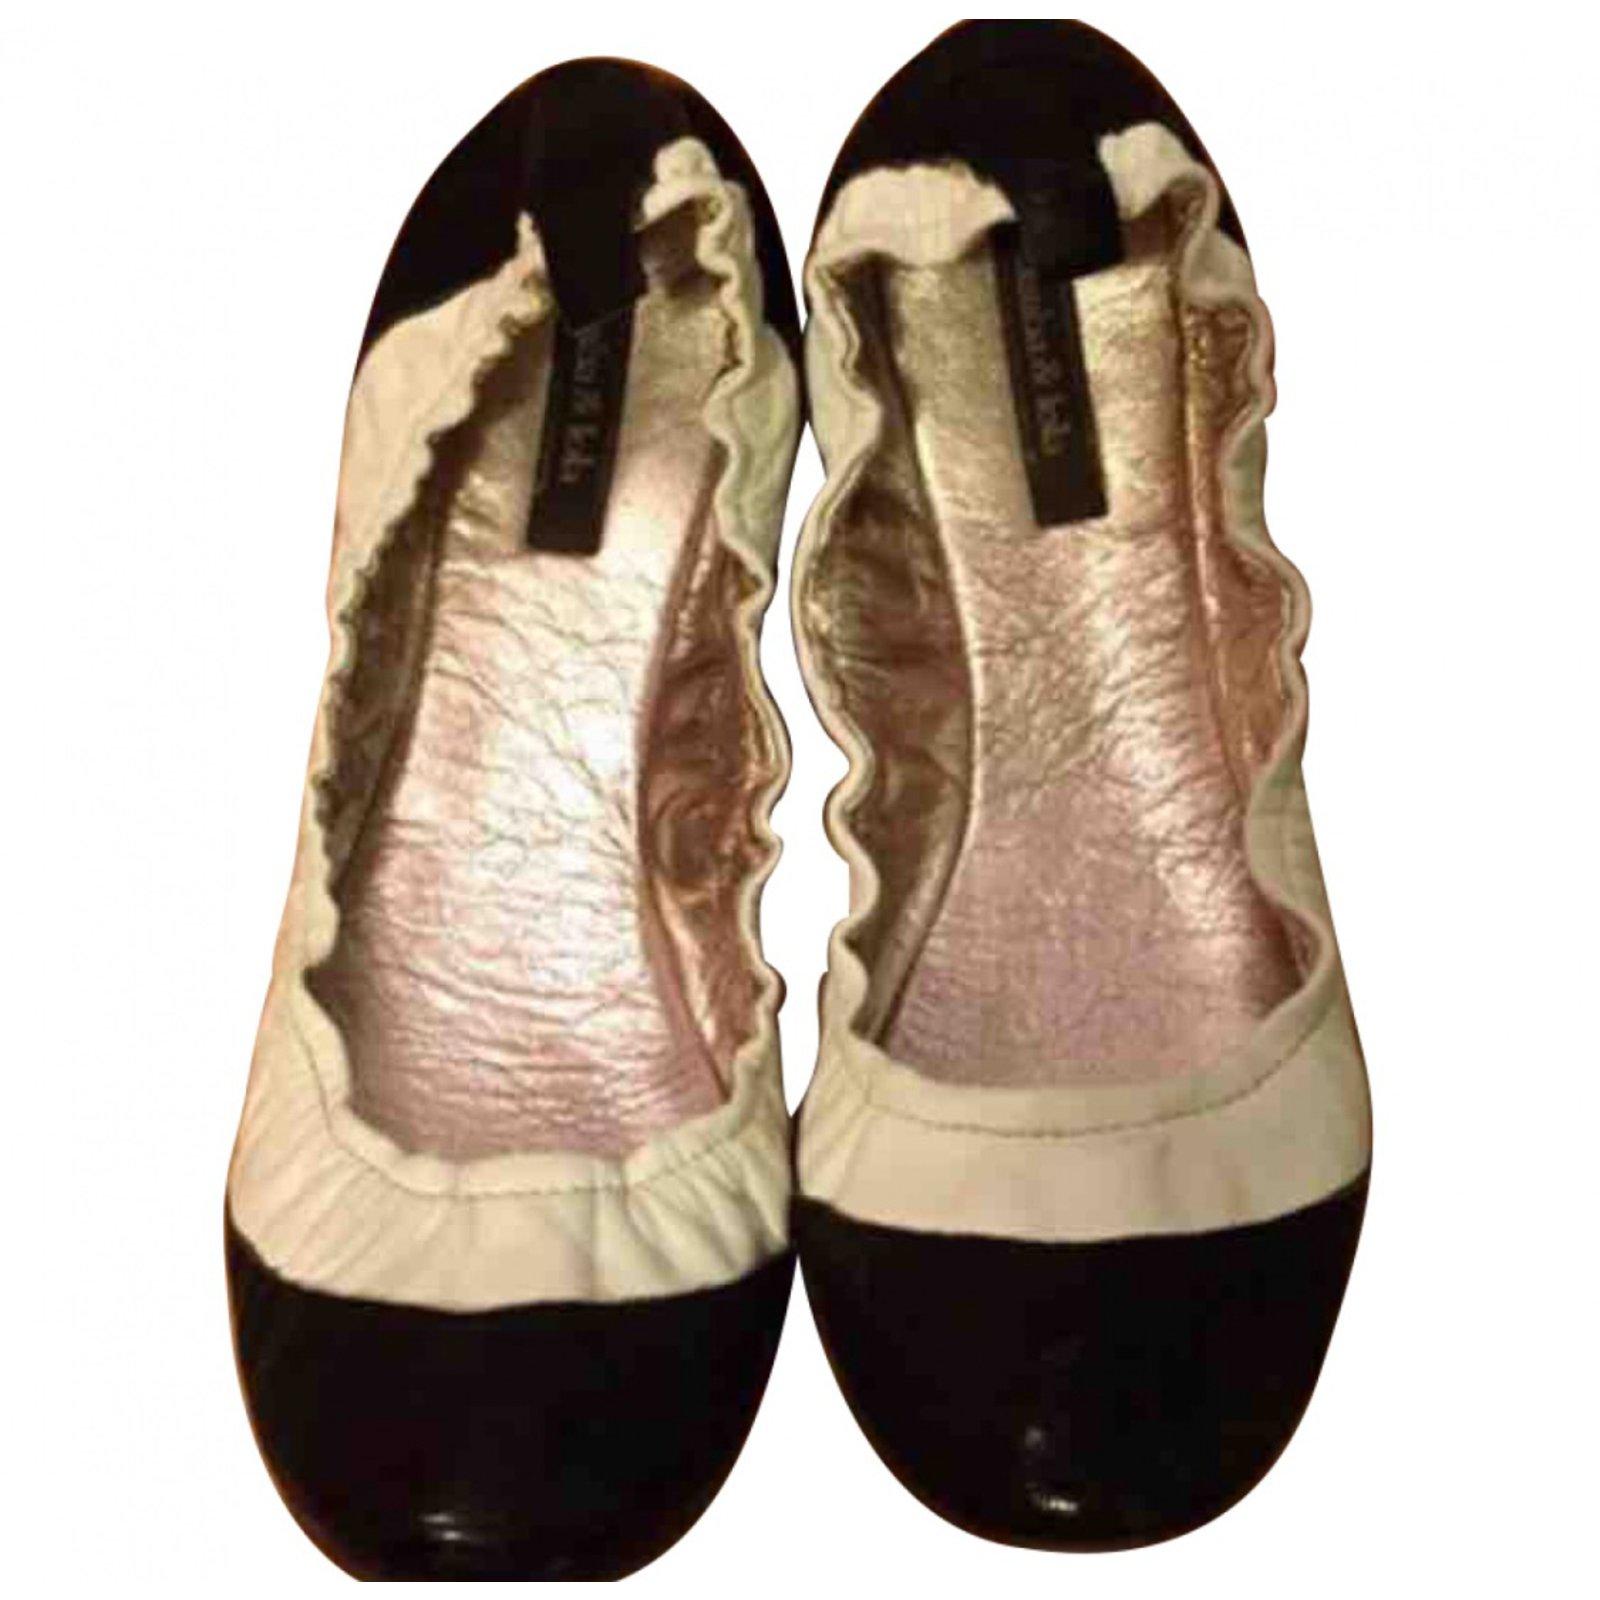 Bimba \u0026 Lola Bimba y Lola shoes Ballet